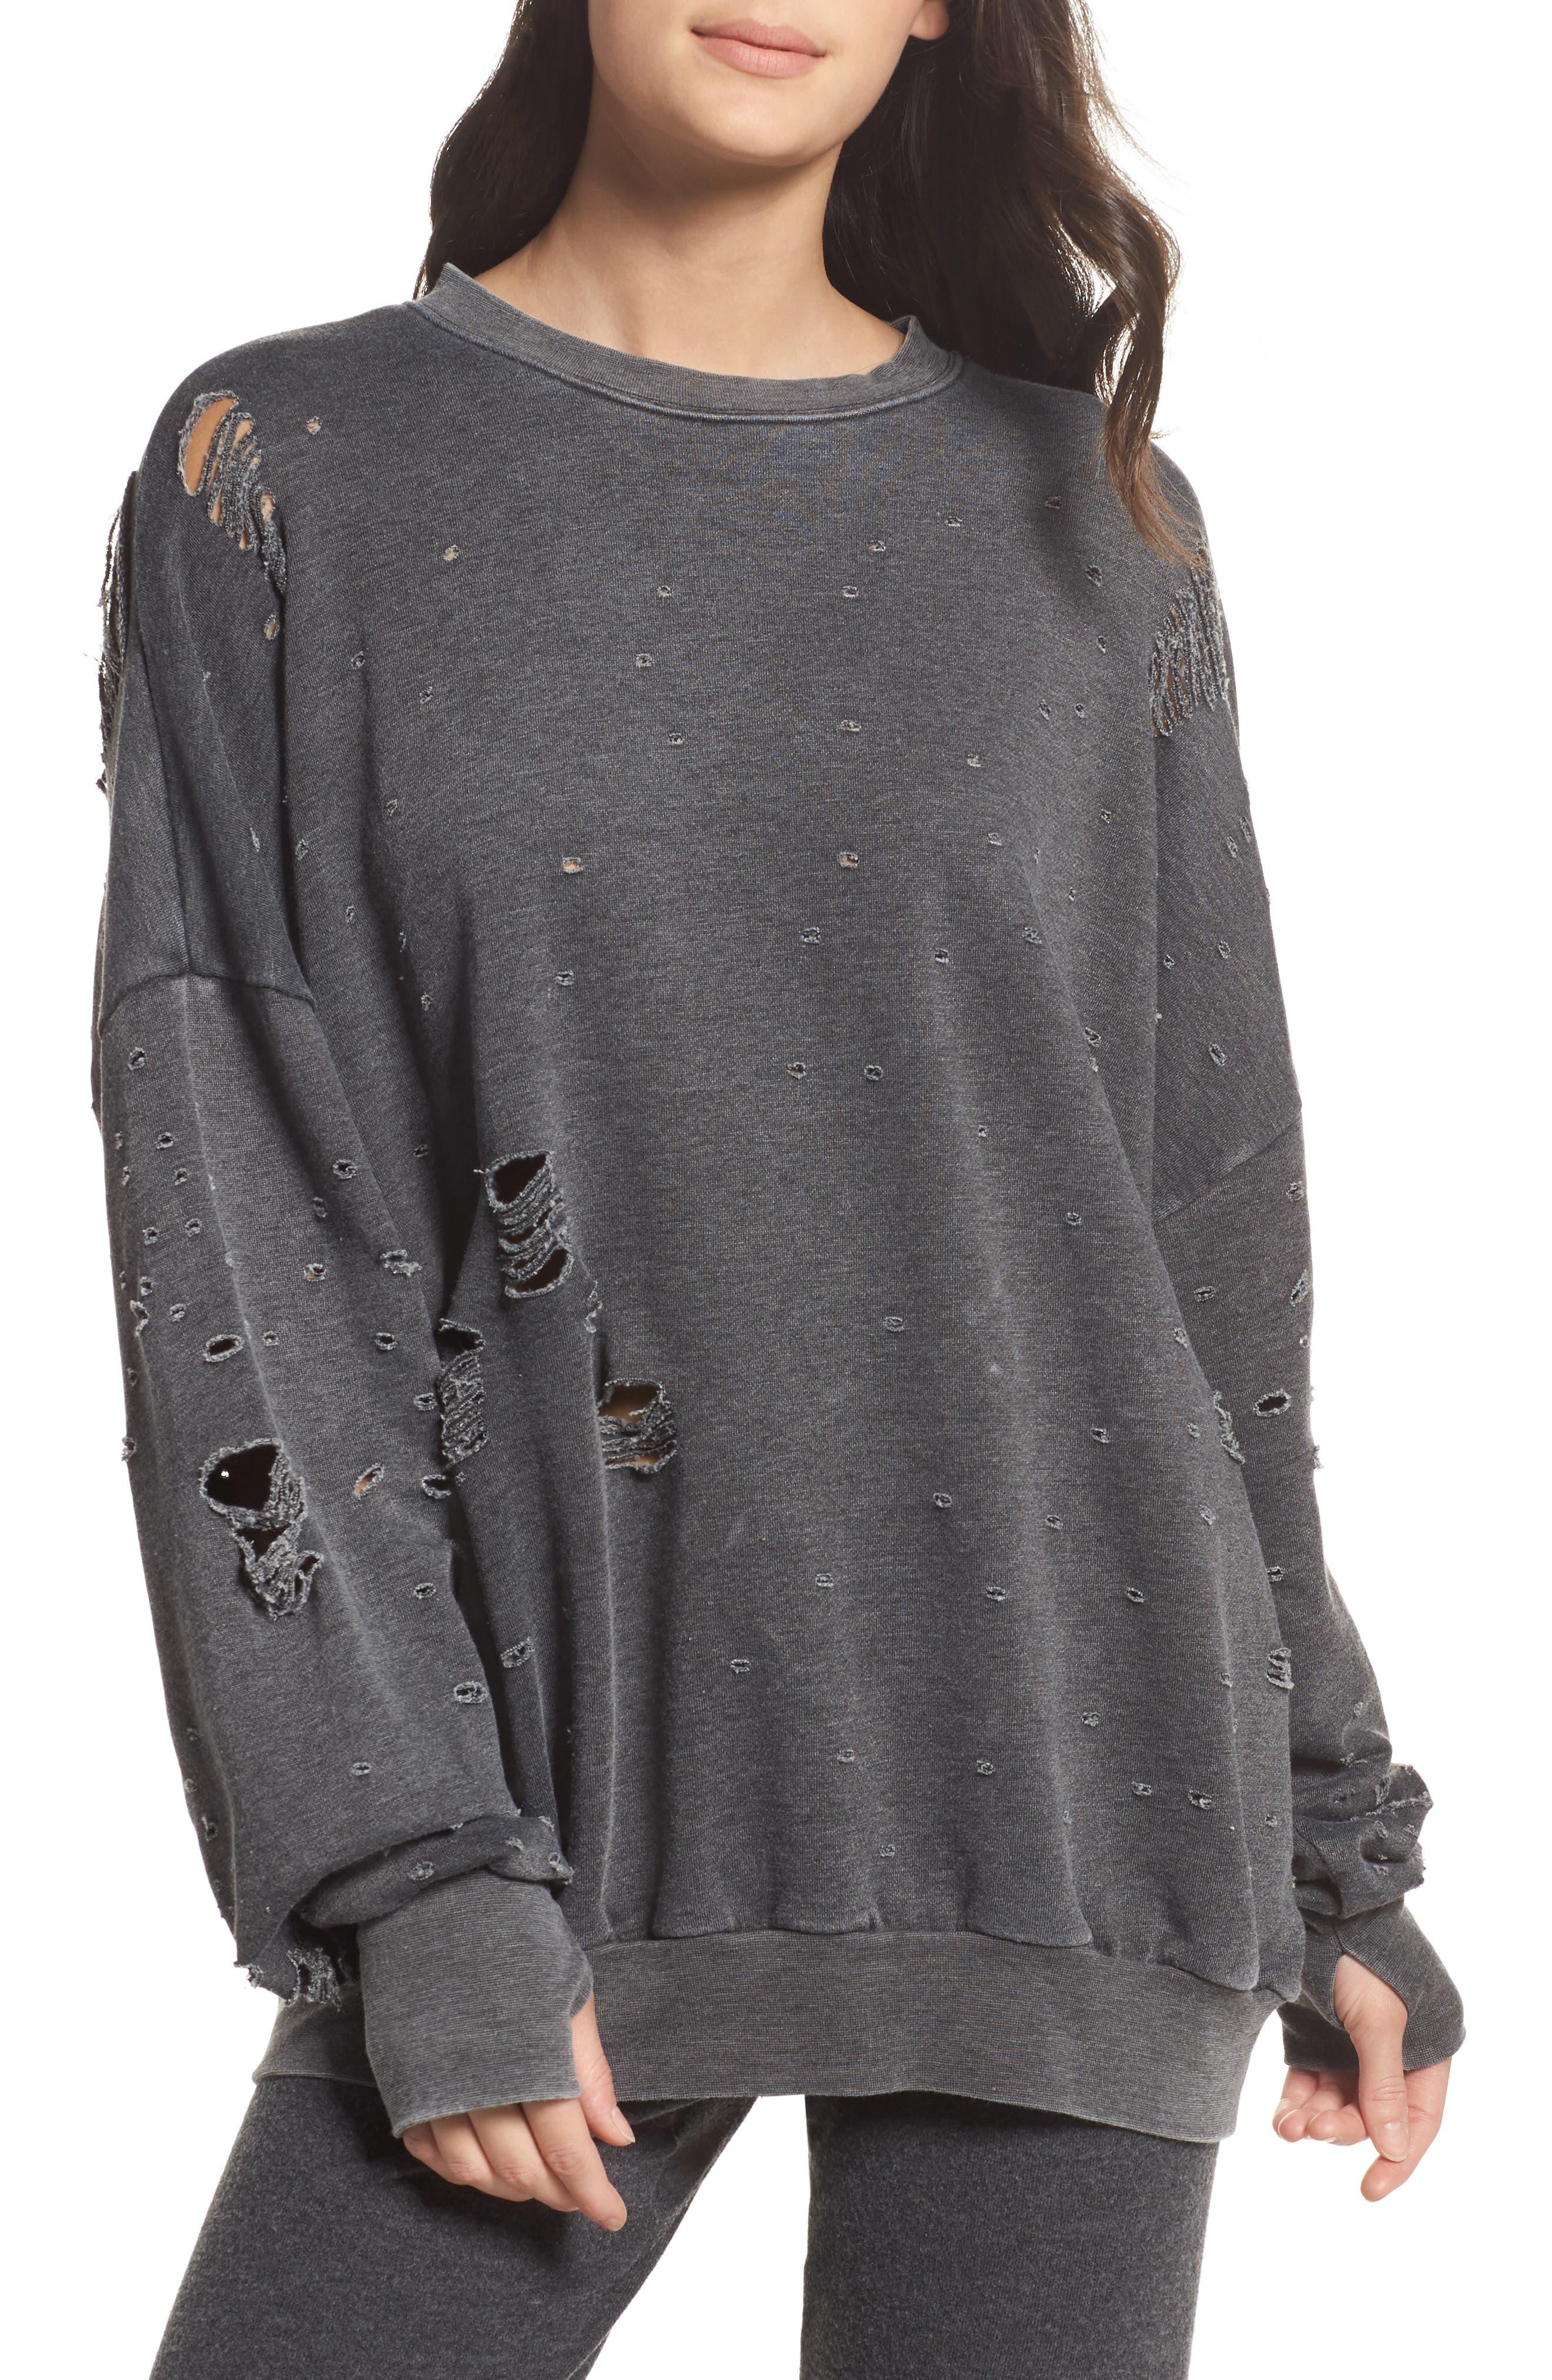 Thrasher Sweatshirt,                         Main,                         color,